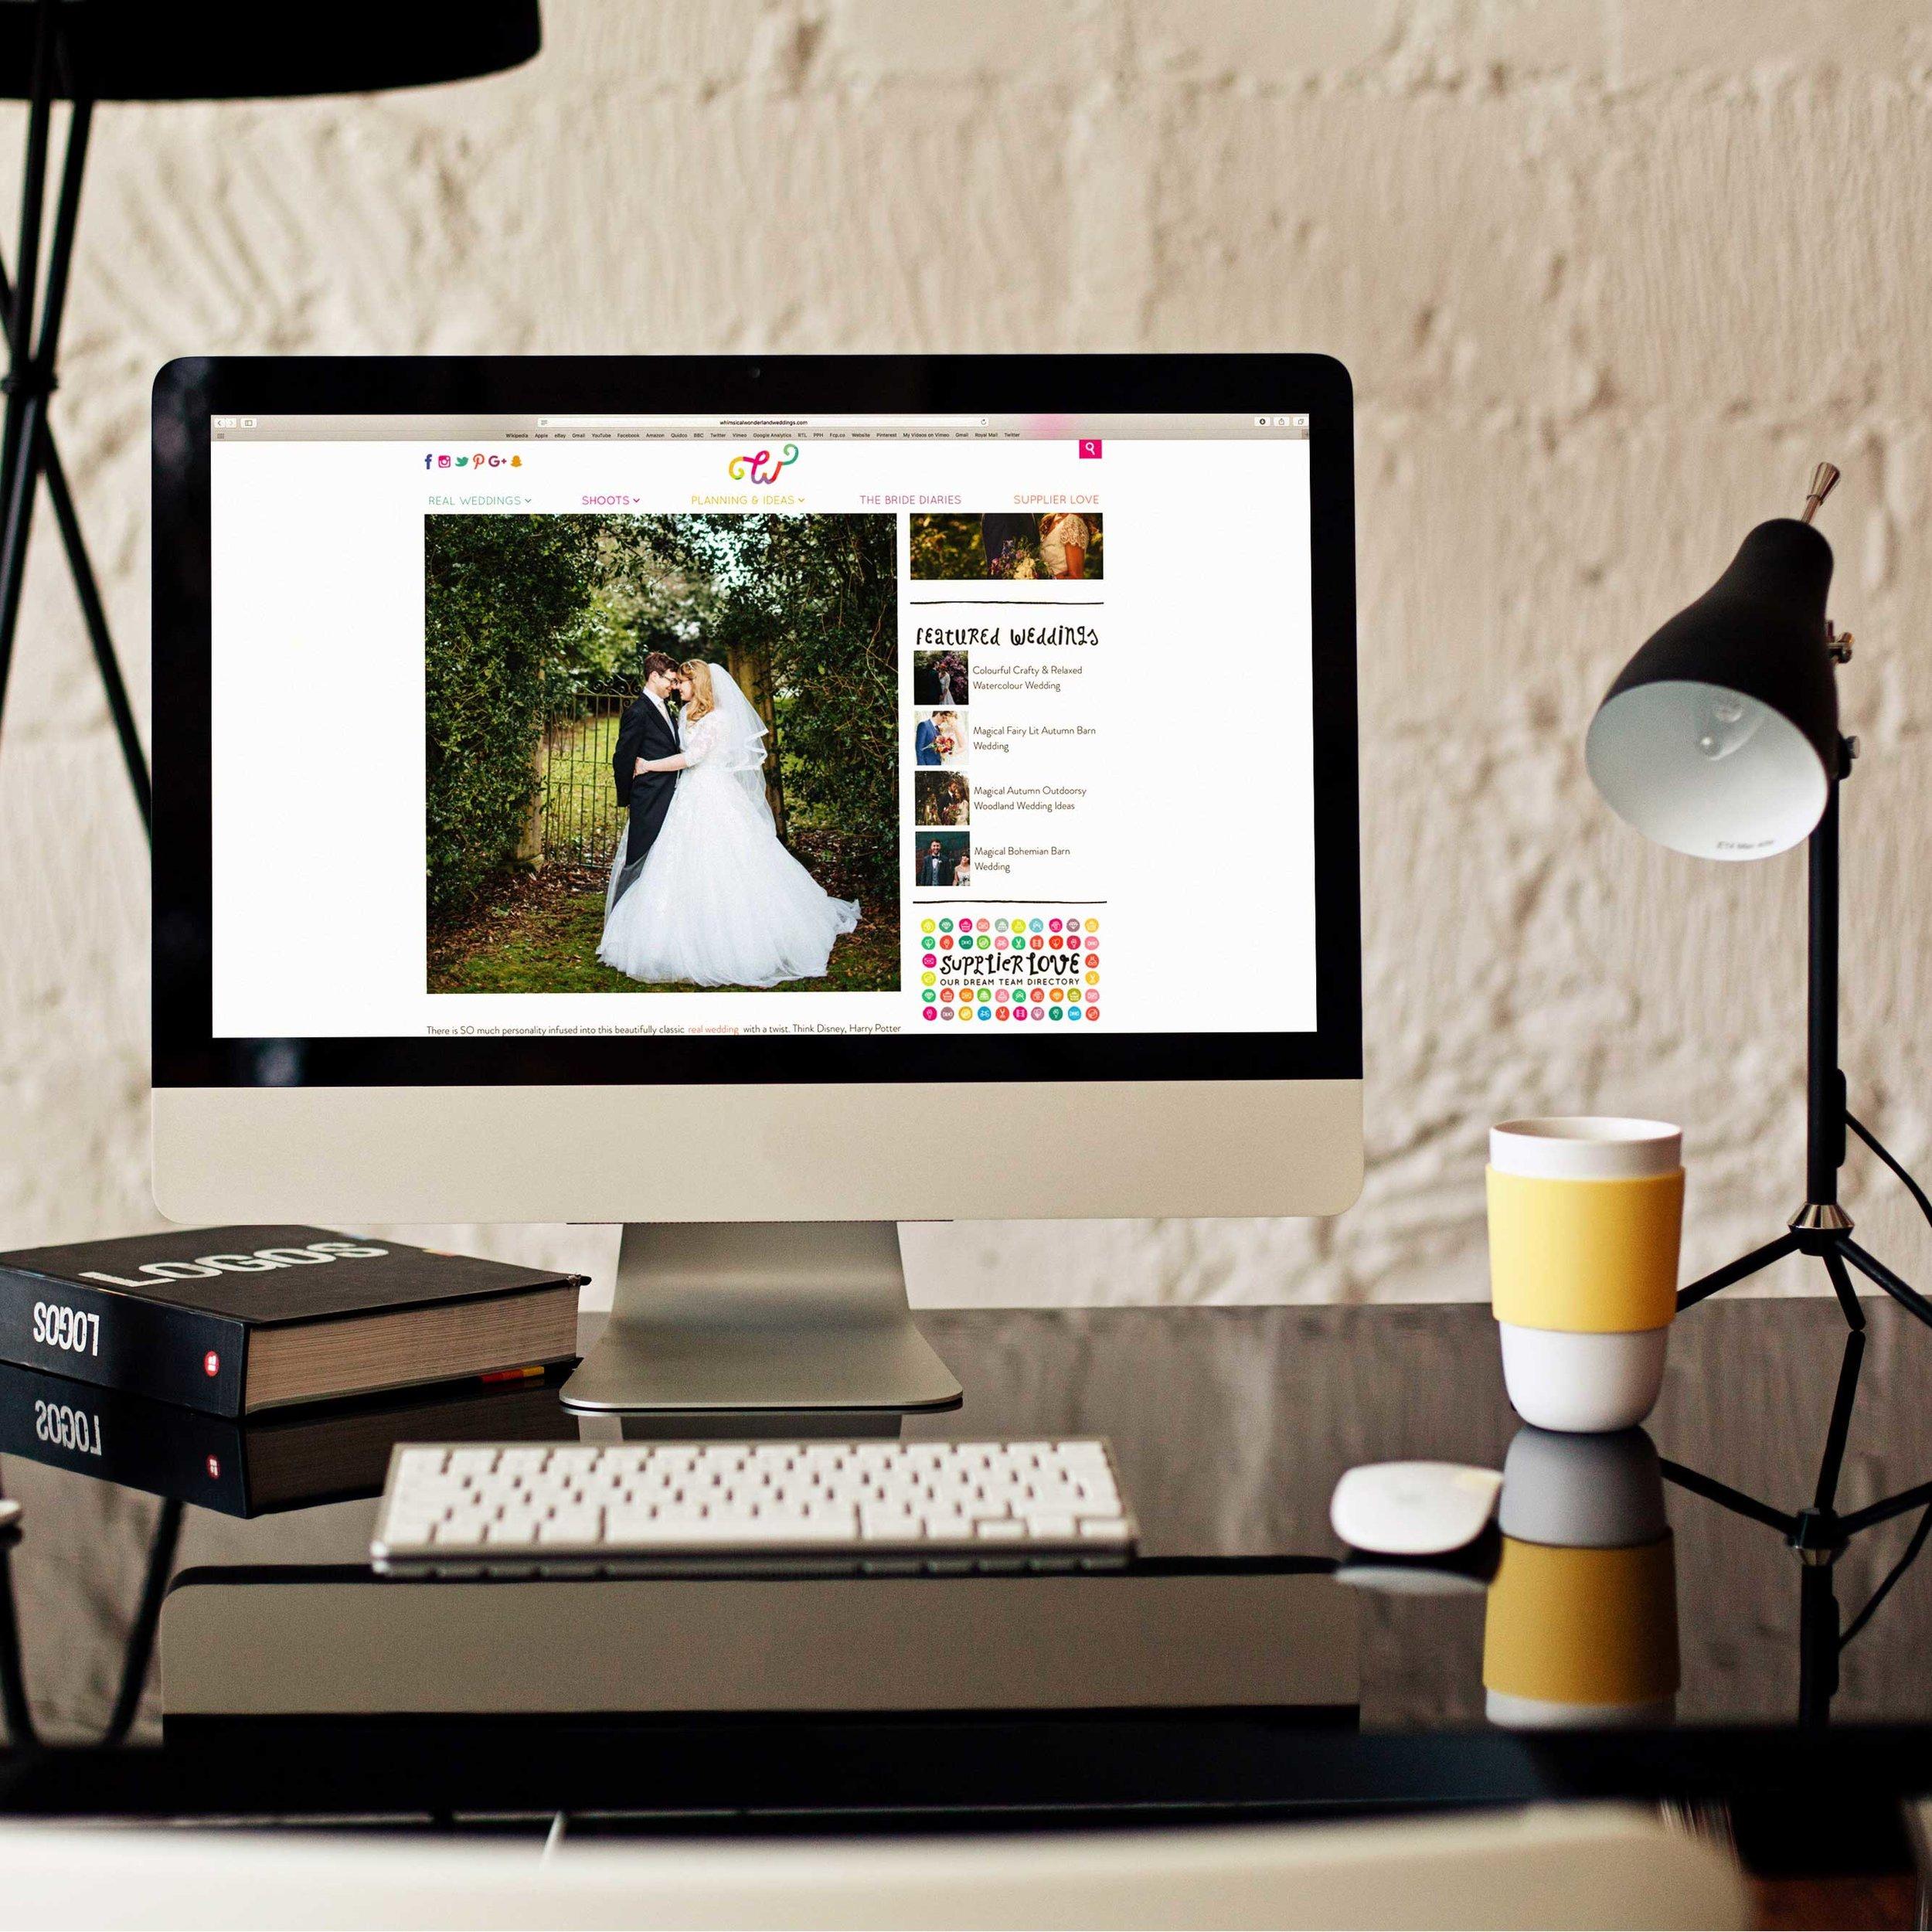 andrew-collin-videographer-whimsical-wonderland-weddings